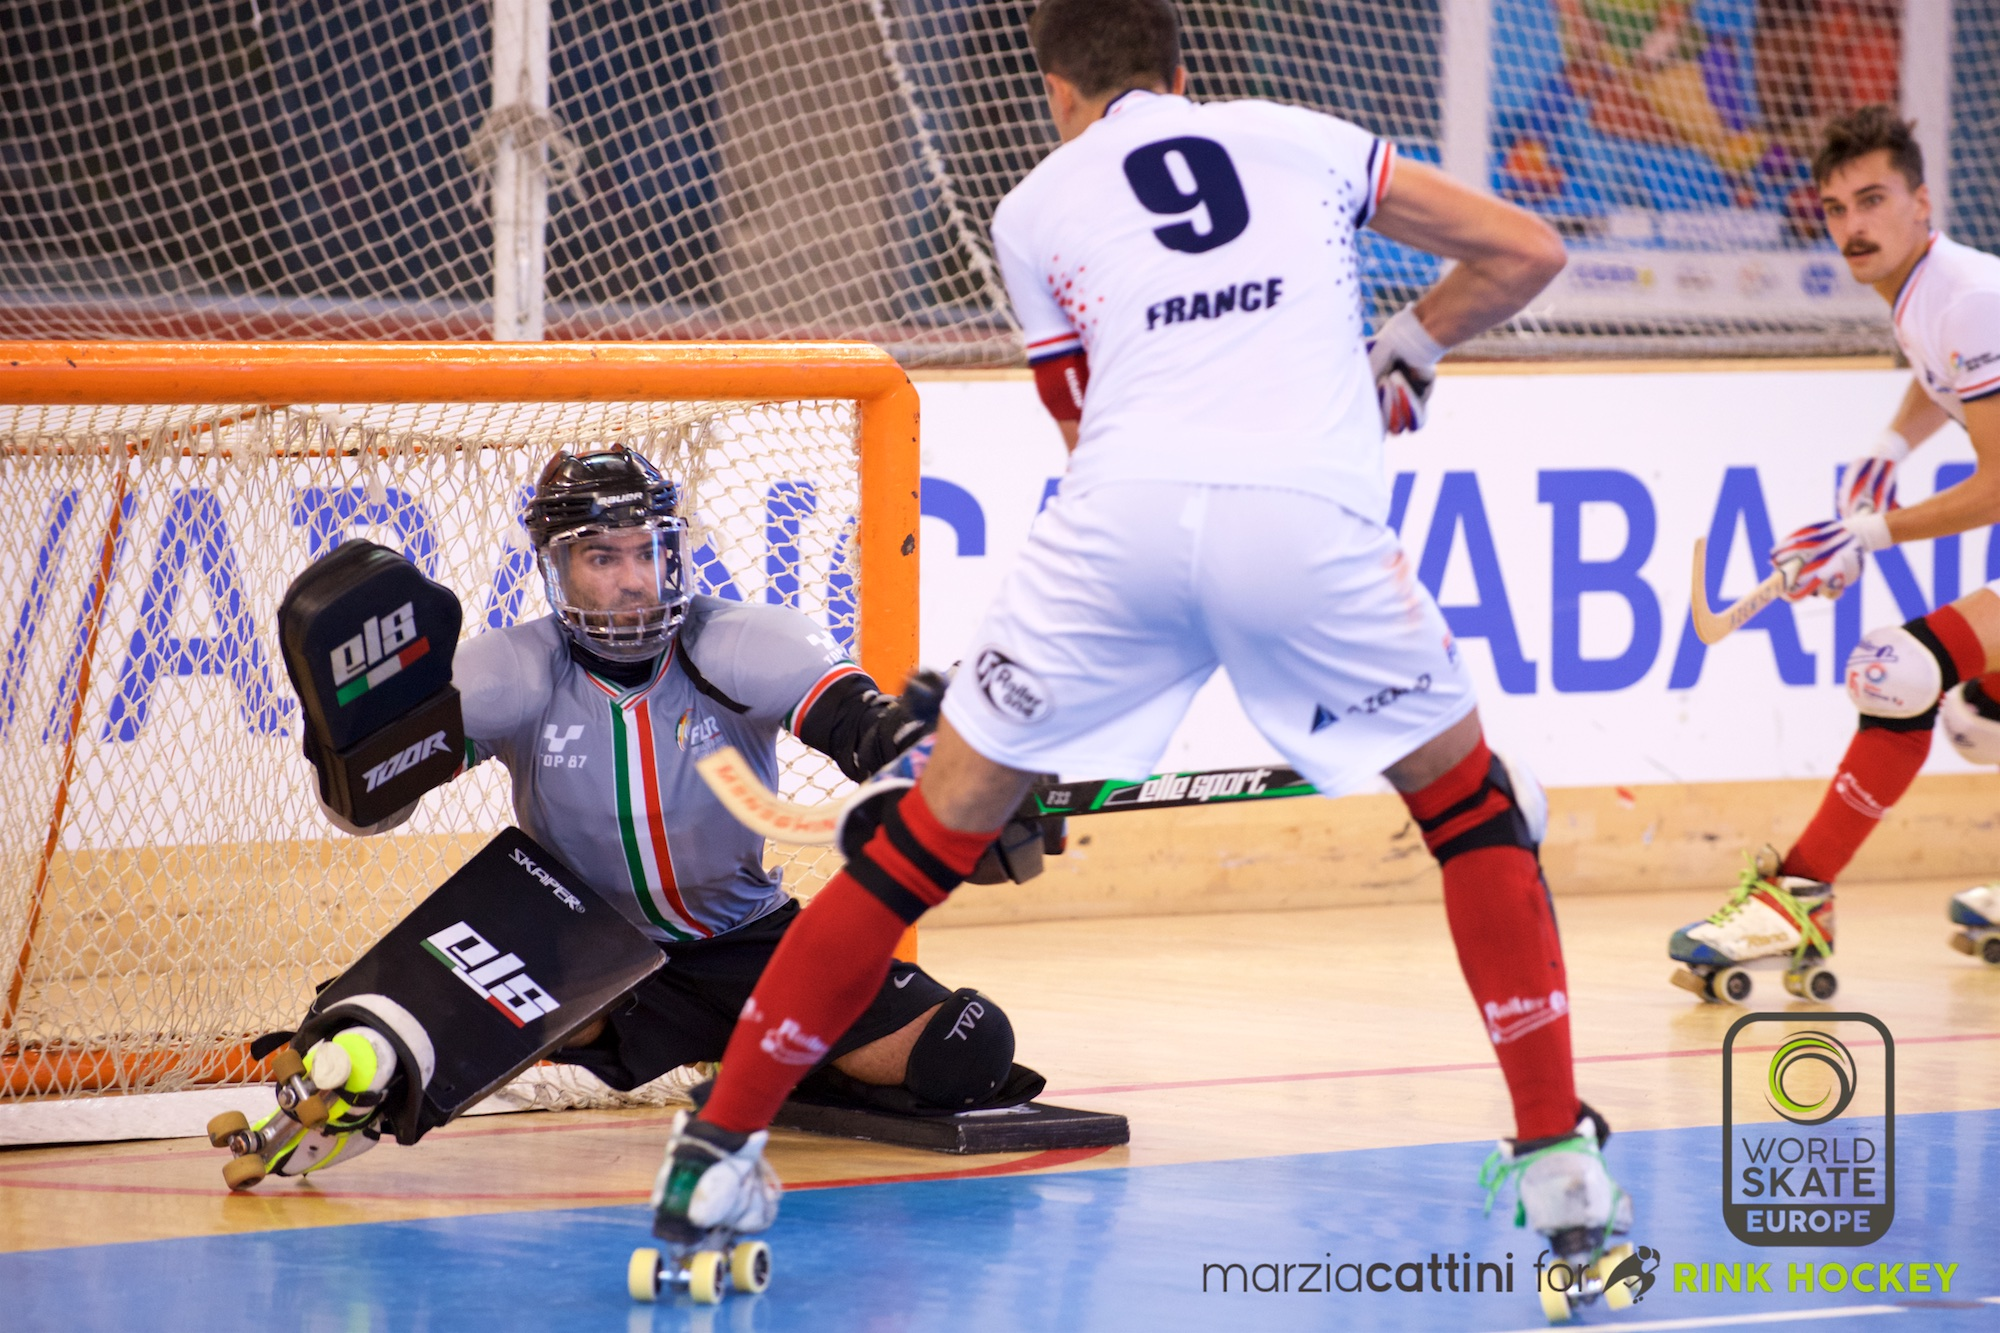 MarziaCattini18-07-22-4France-Italy15